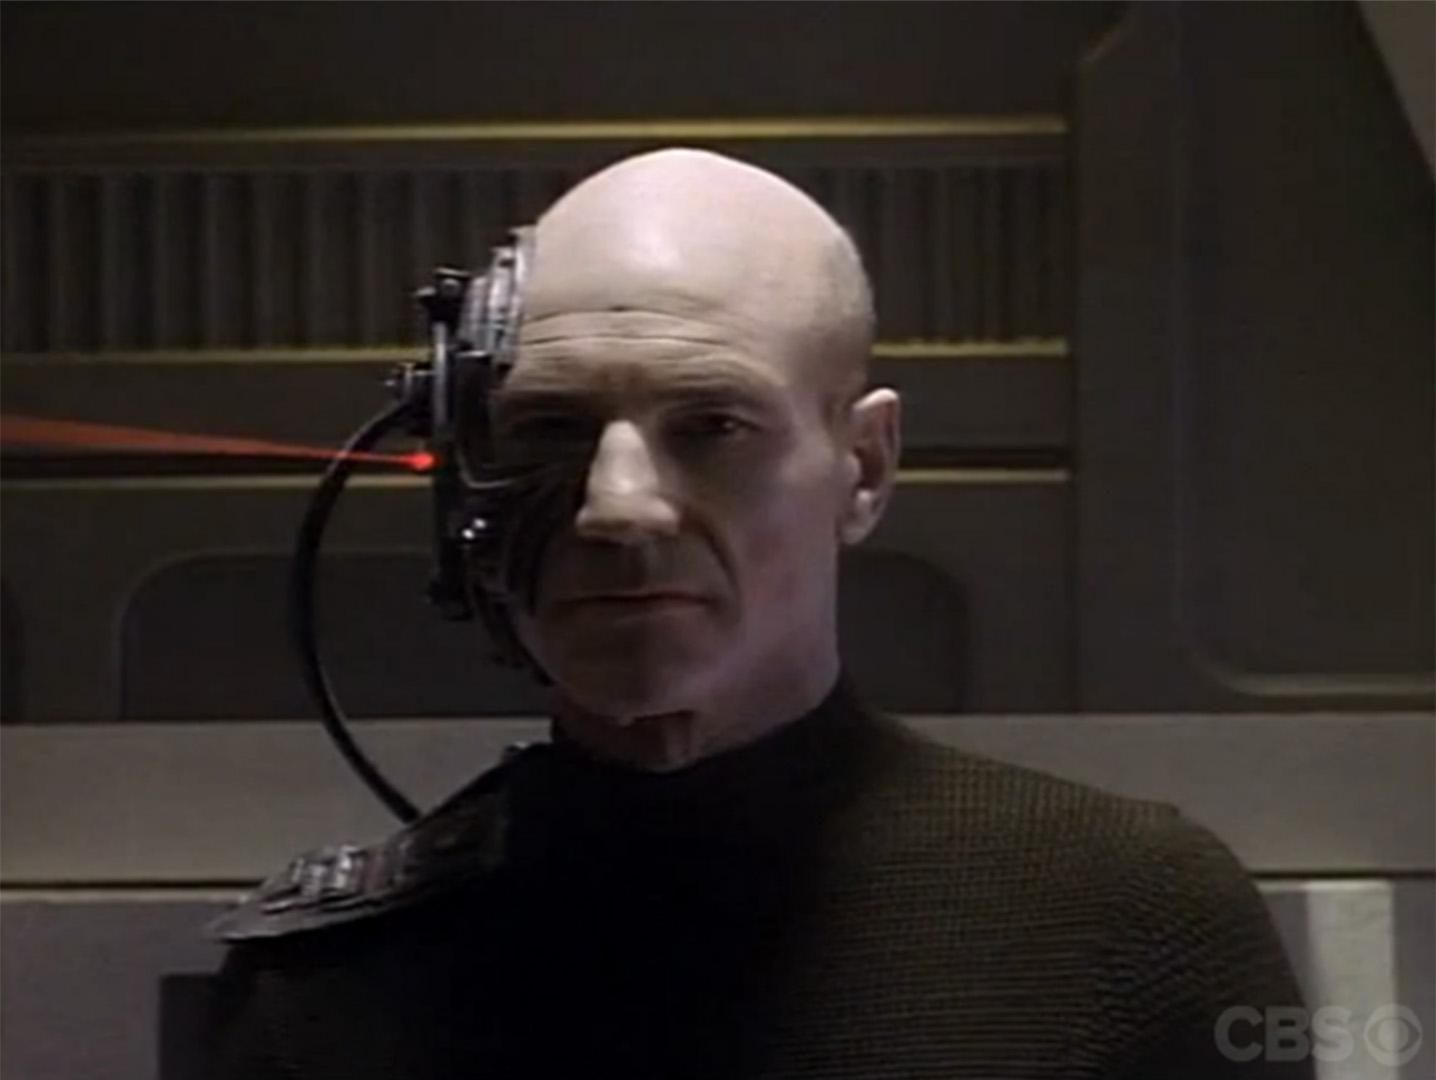 The Best of Both Worlds (Star Trek: The Next Generation, Season 3, Episode 26 and Season 4, Episode 1)